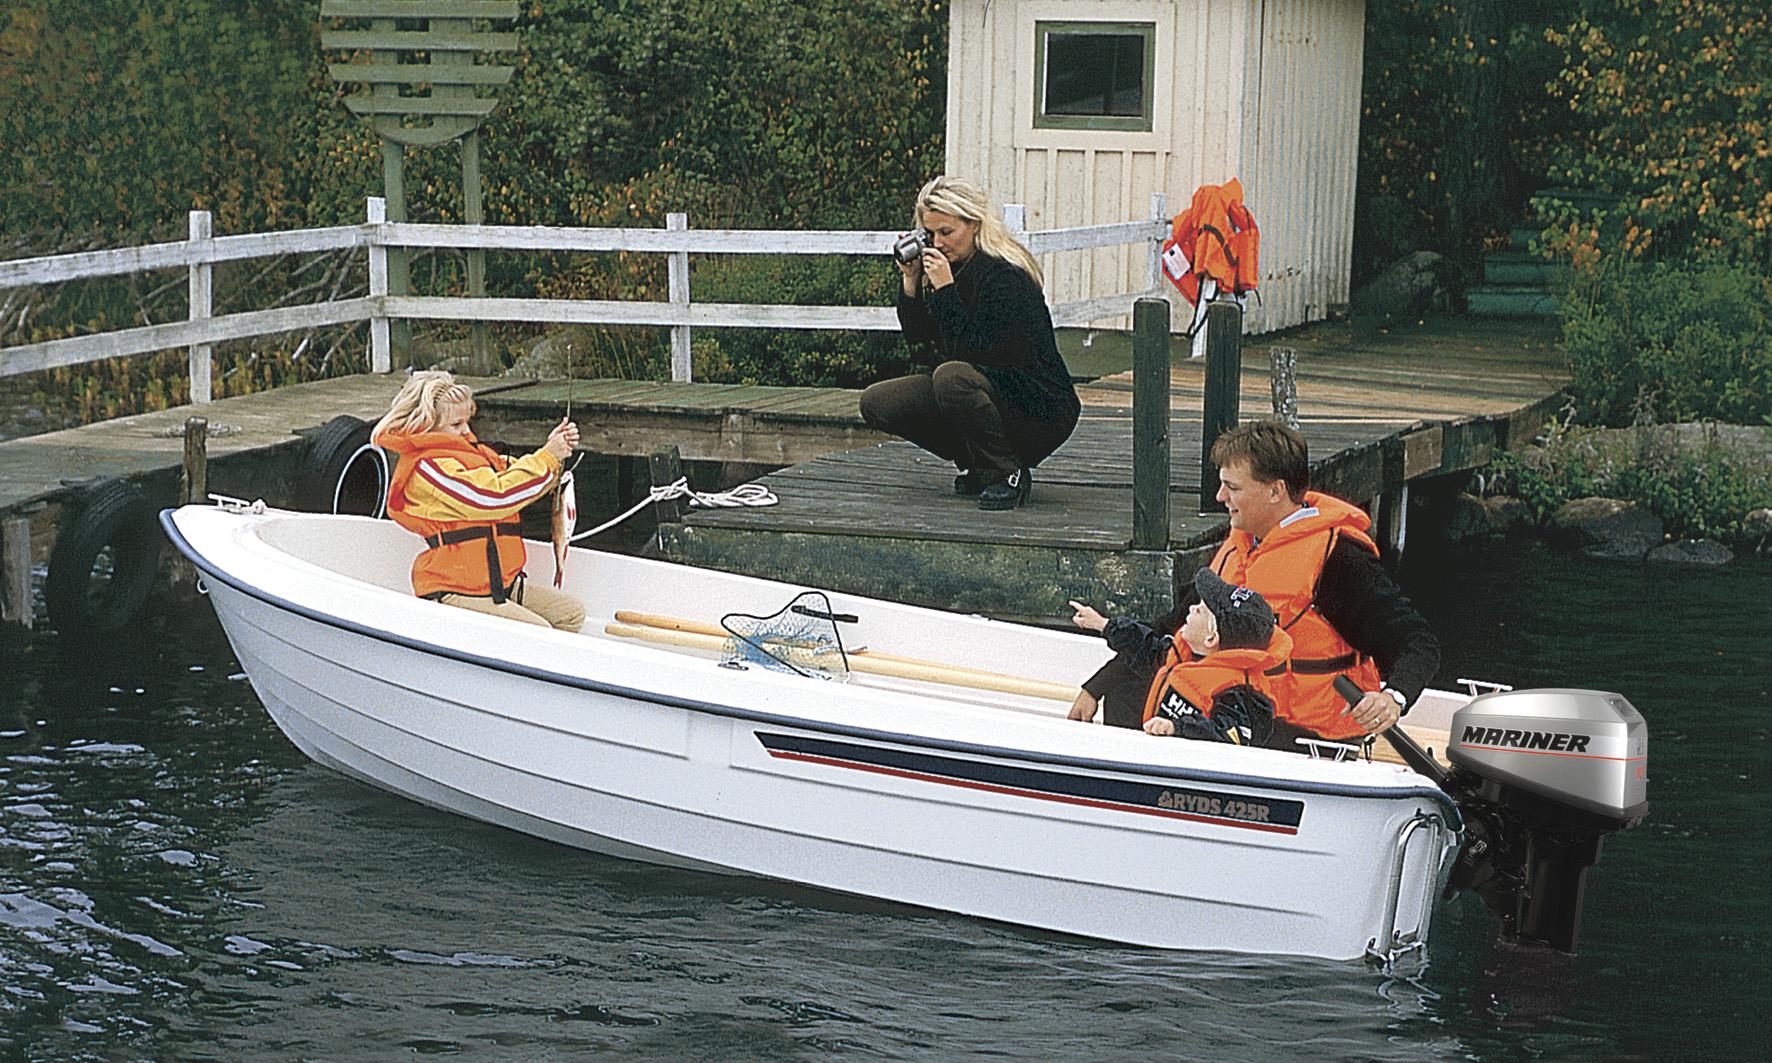 ryds båtar äldre modeller